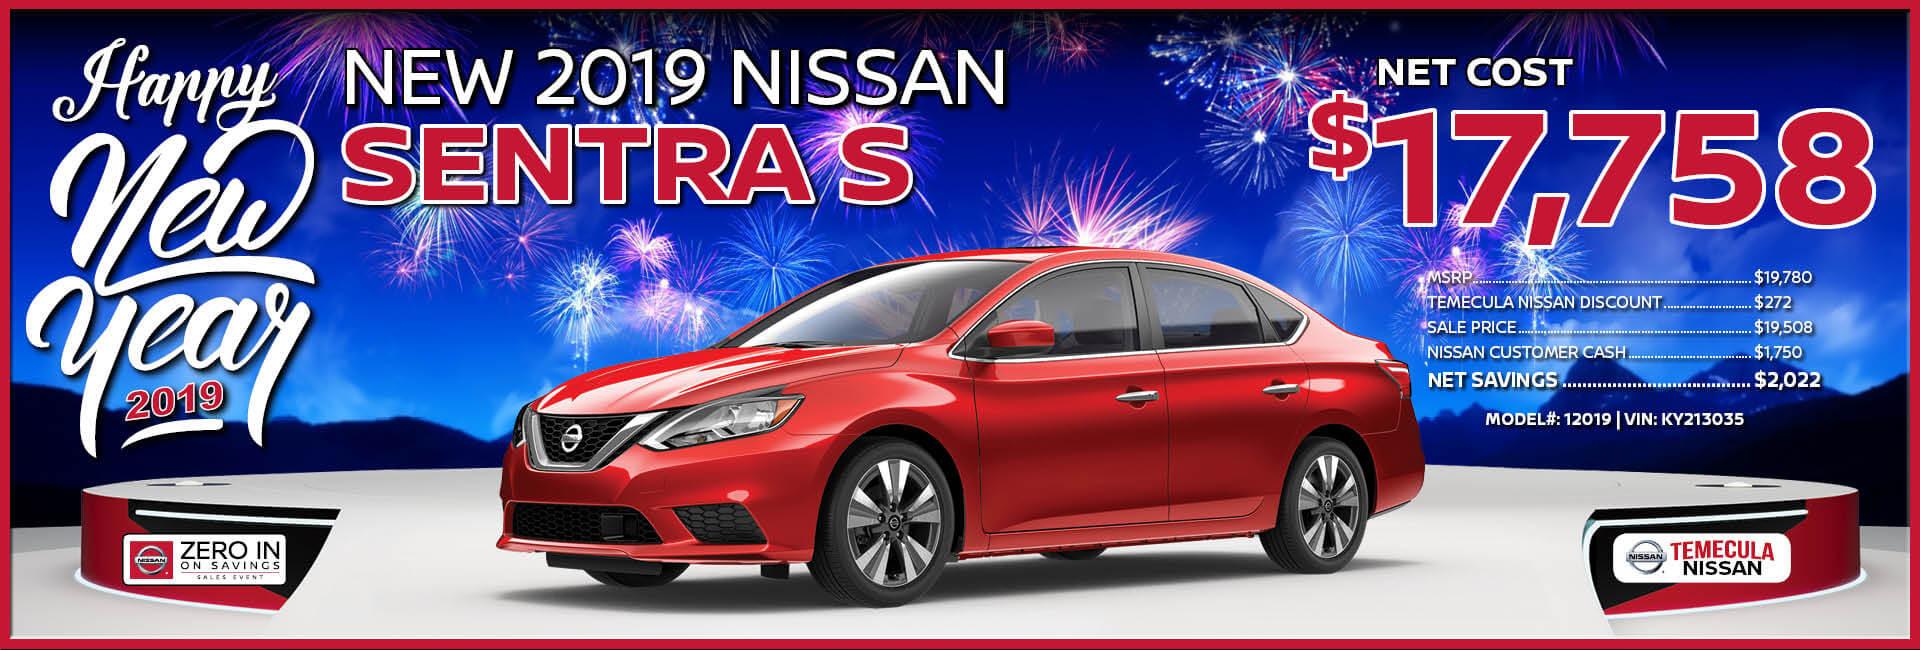 Nissan Sentra $17,758